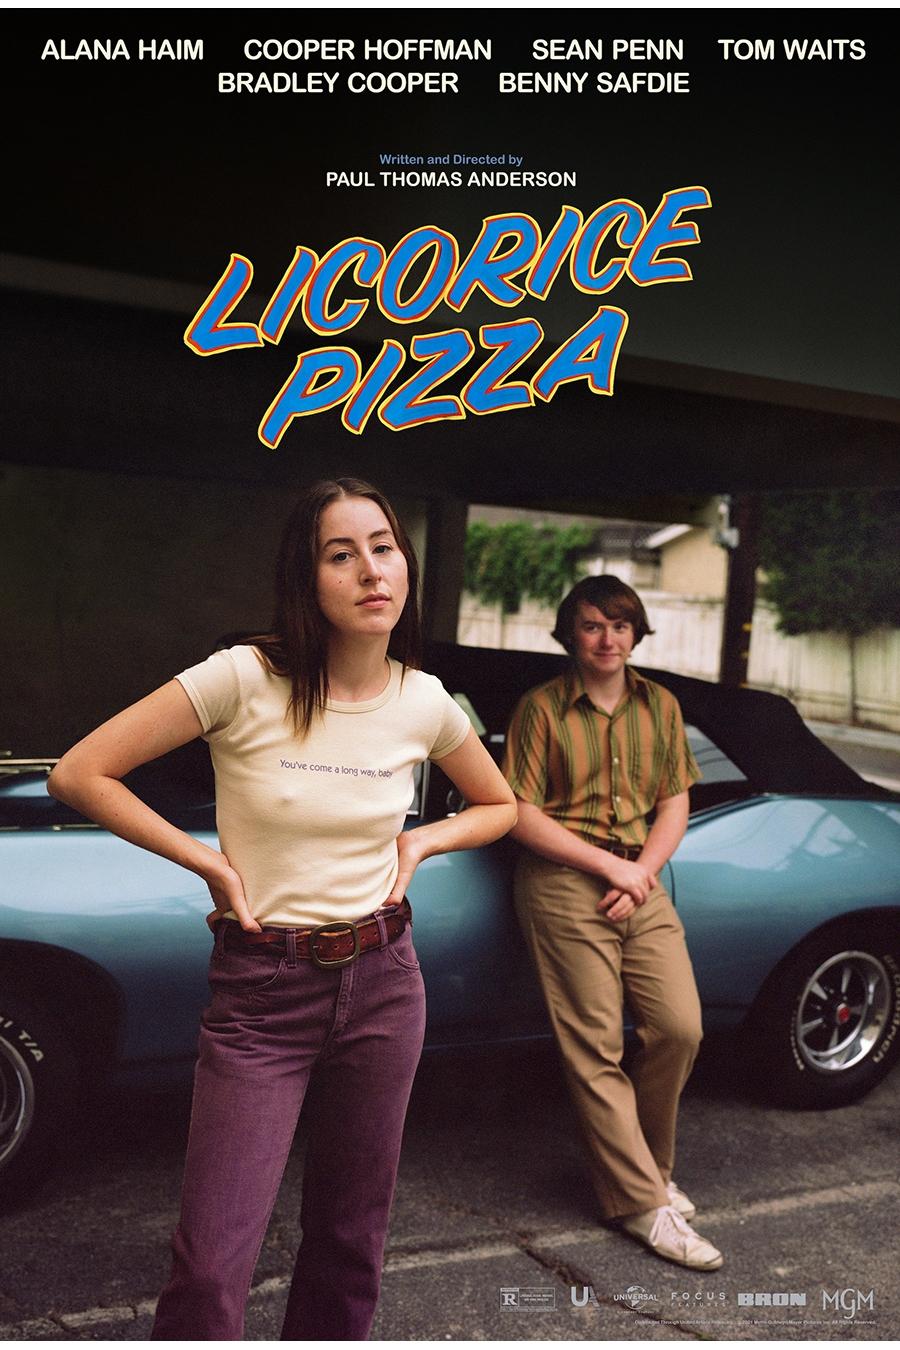 Licorice Pizza film poster